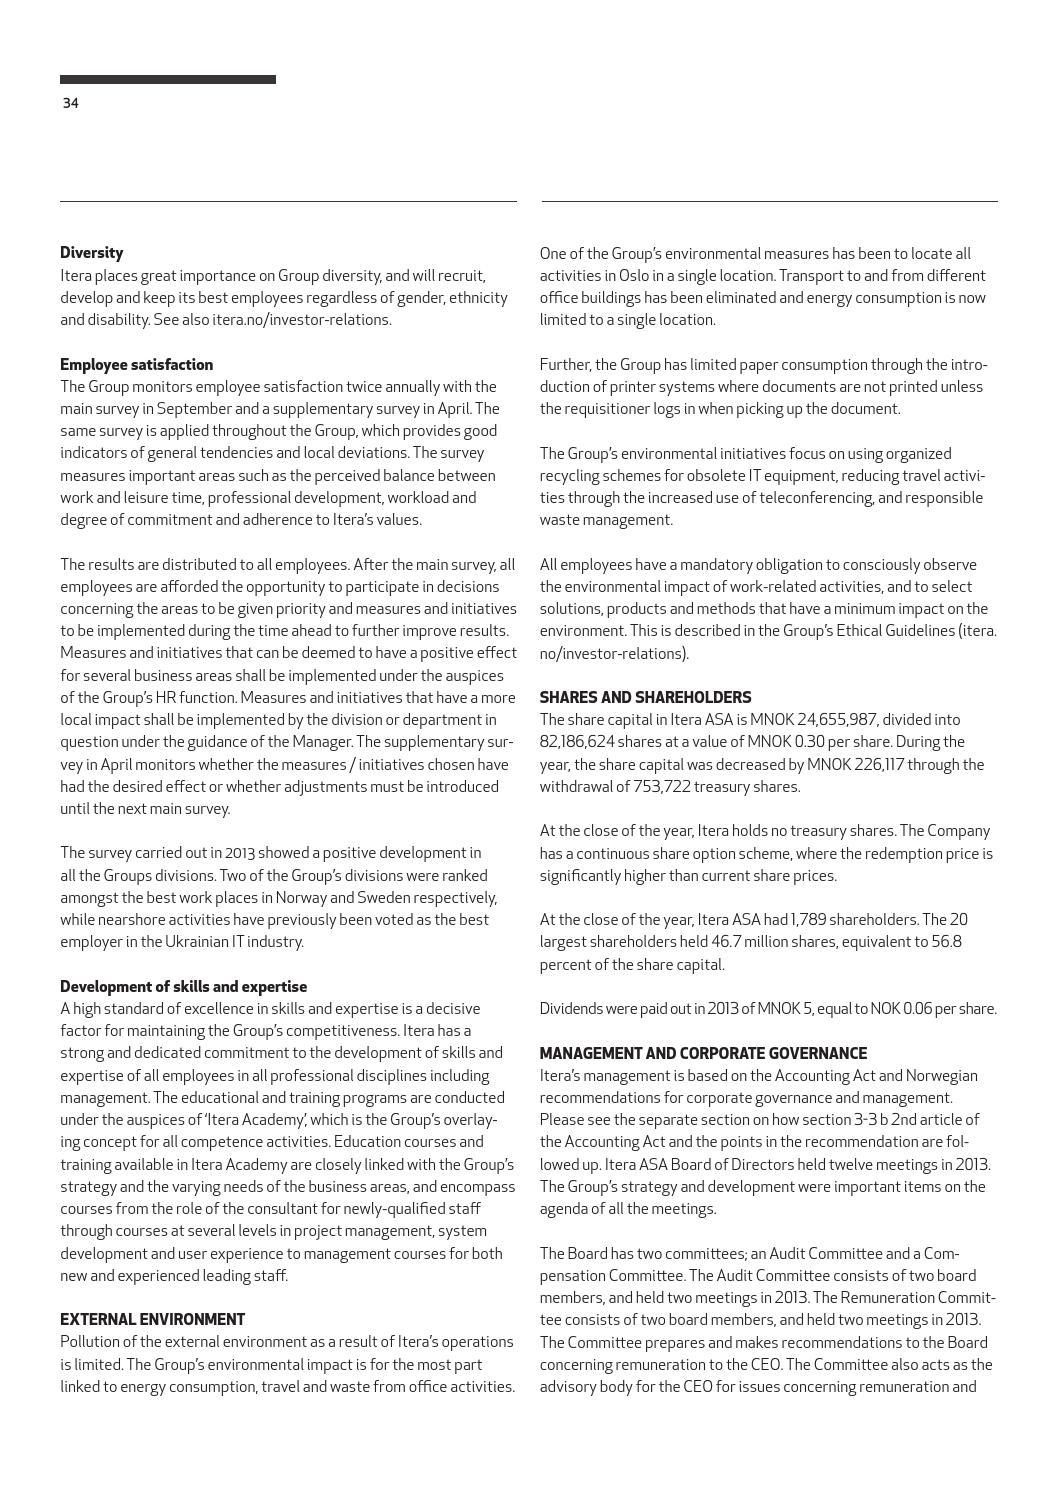 Itera annual report 2013 by Itera - issuu